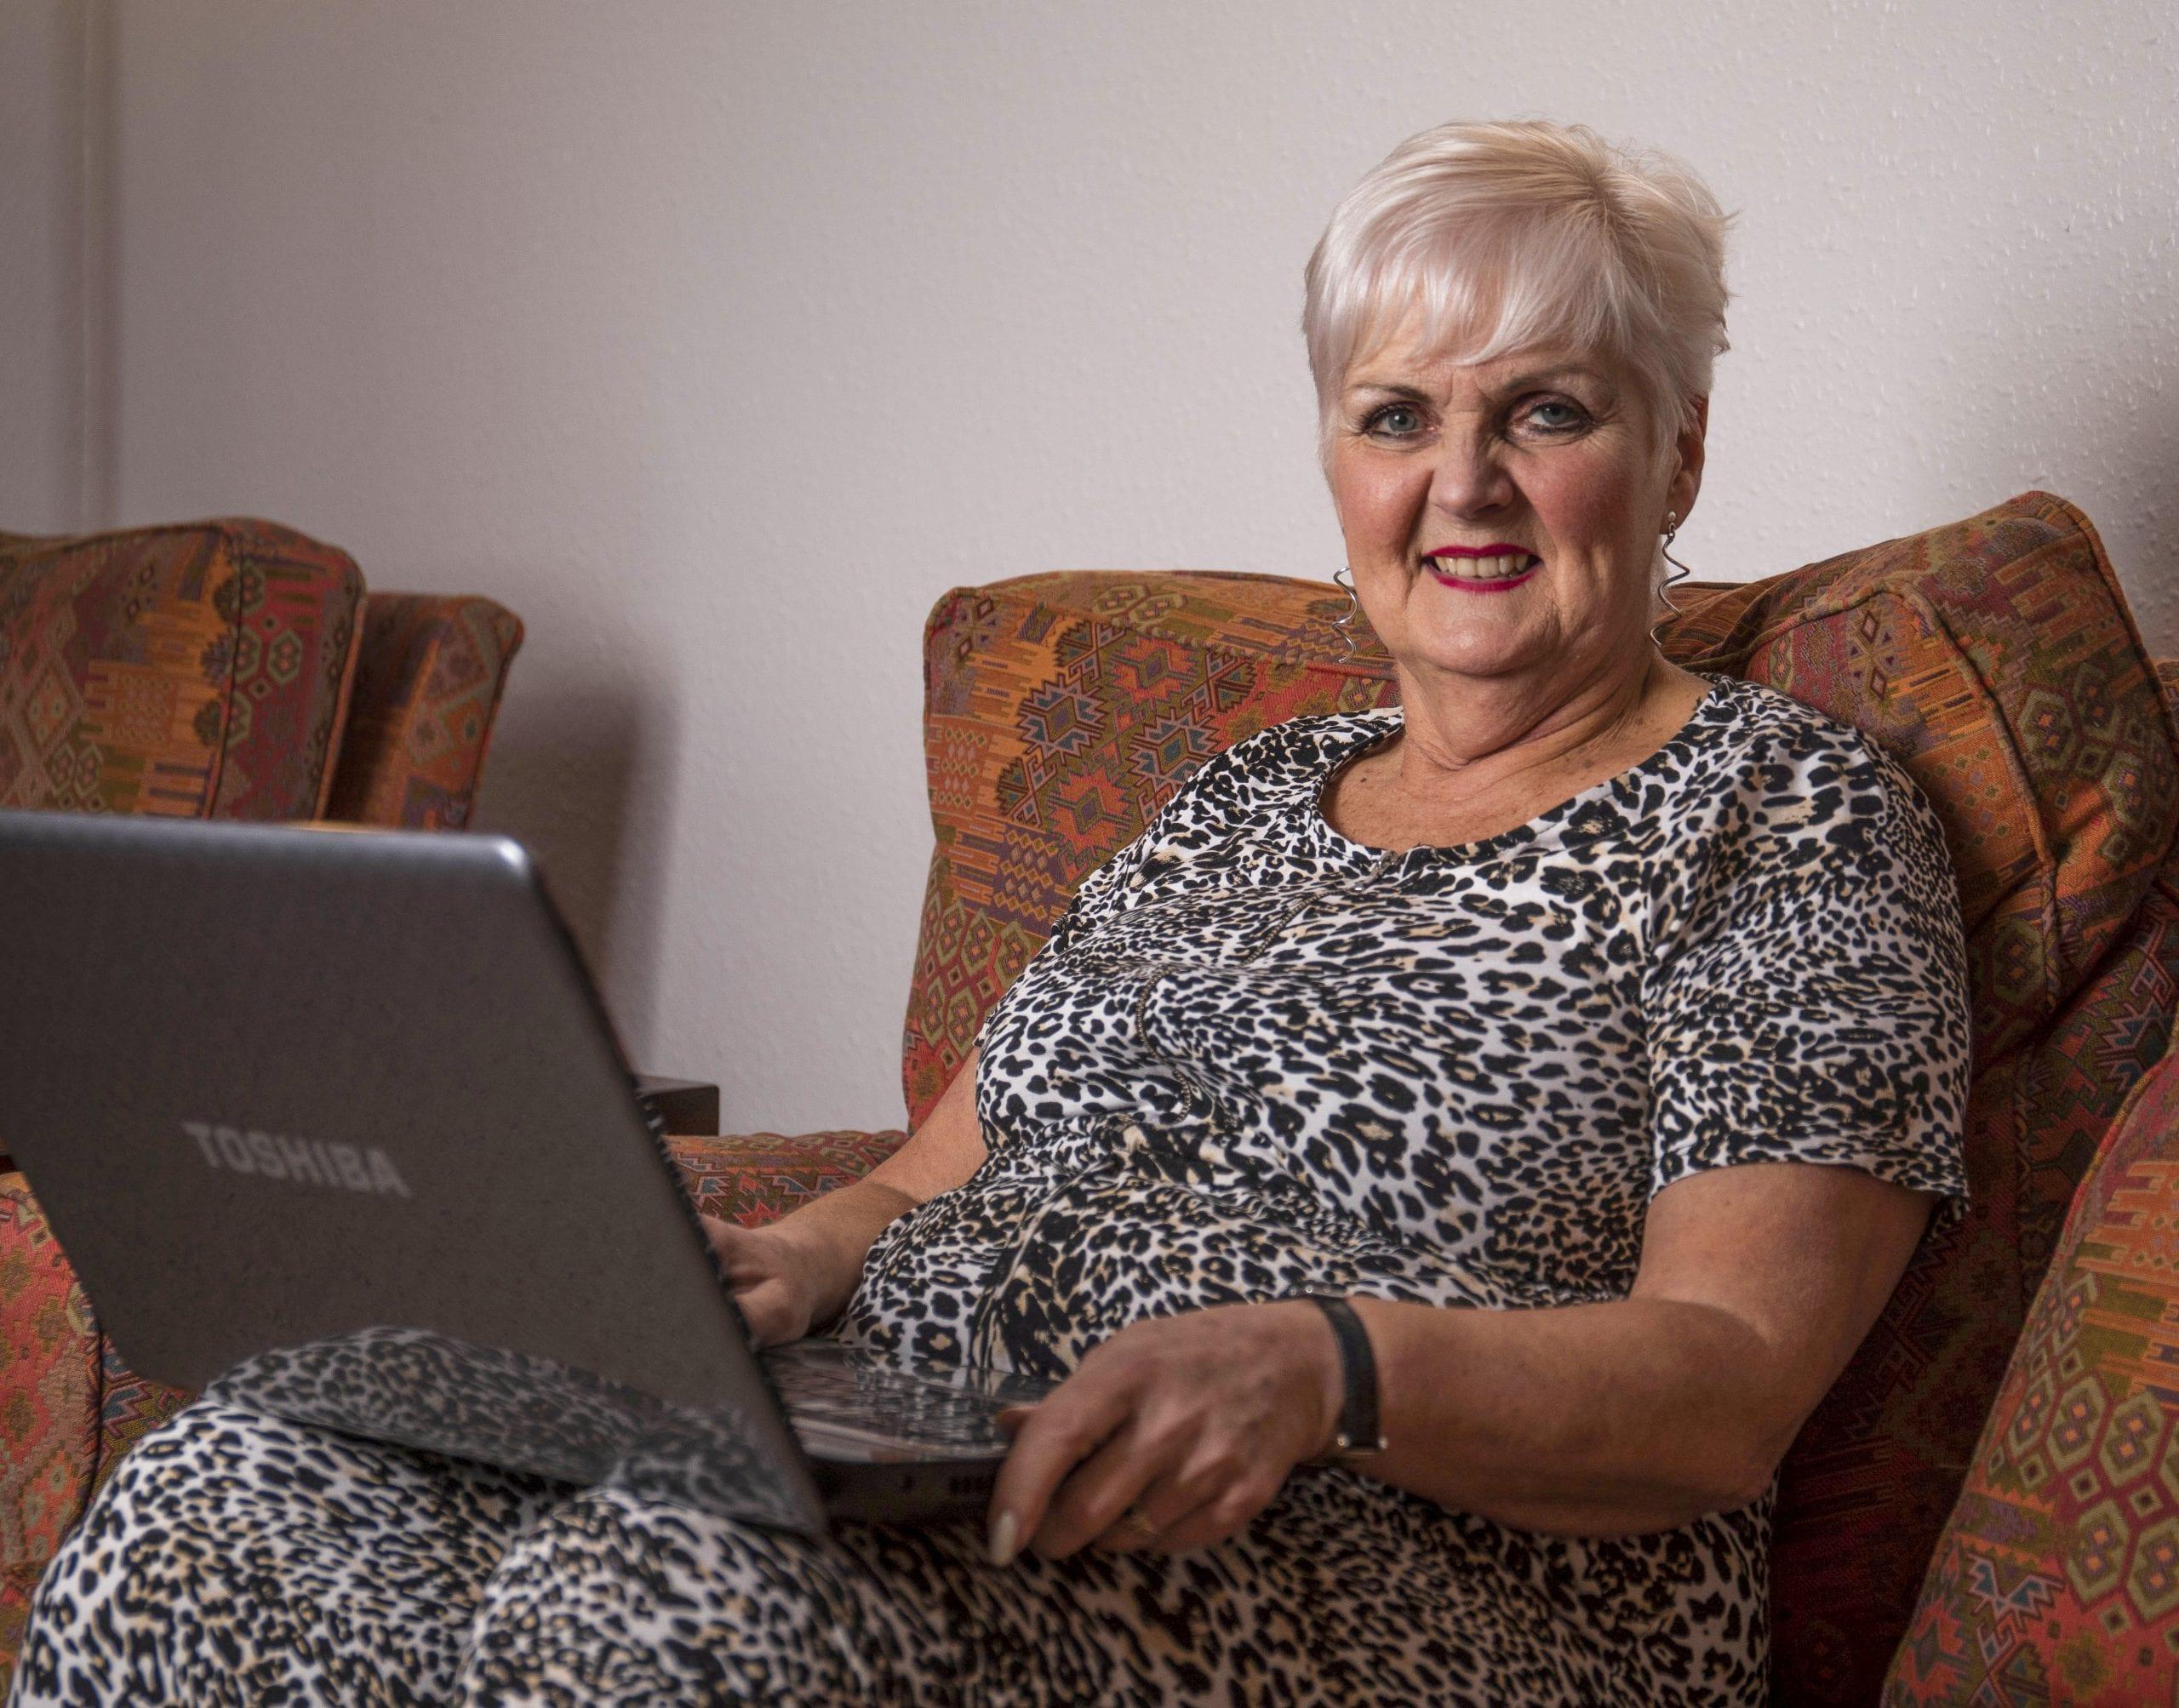 Older women dating website free dating sites in northern ireland